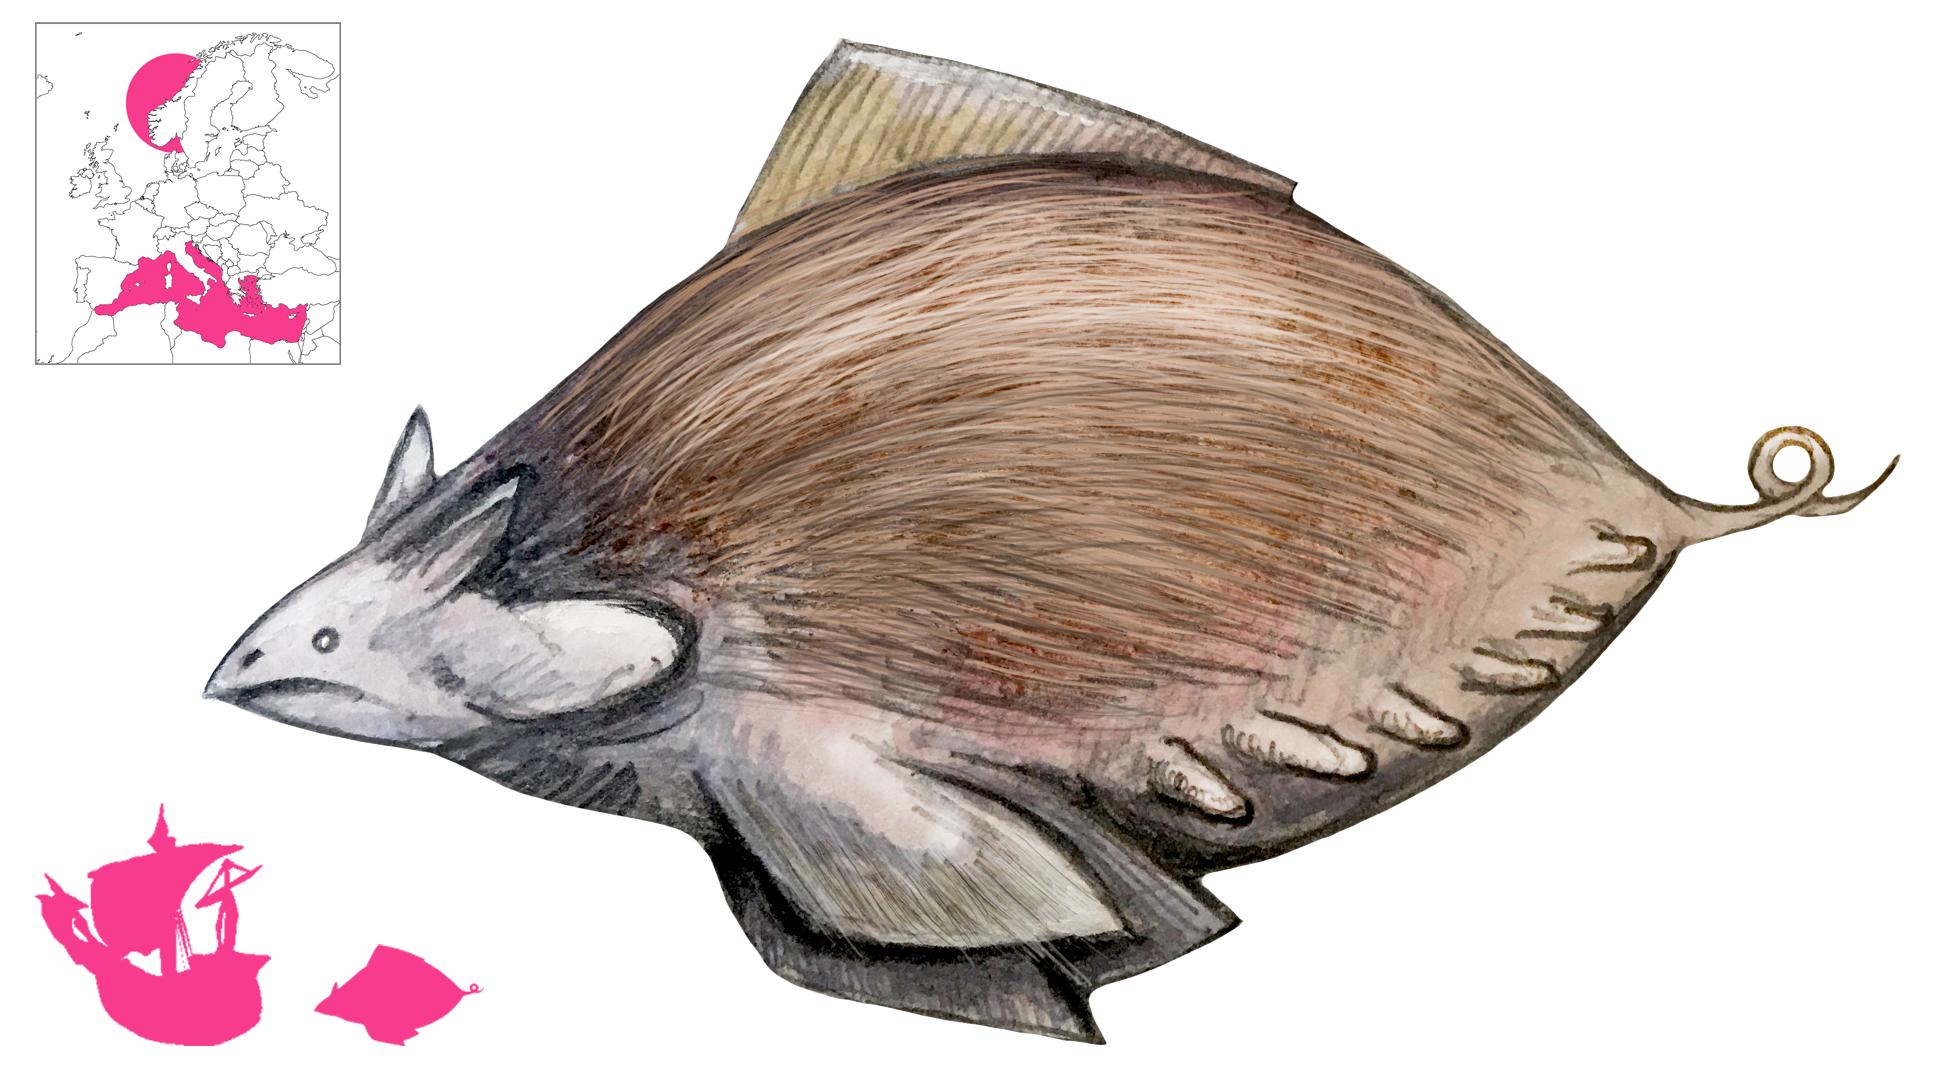 Swamfisk final - Copy